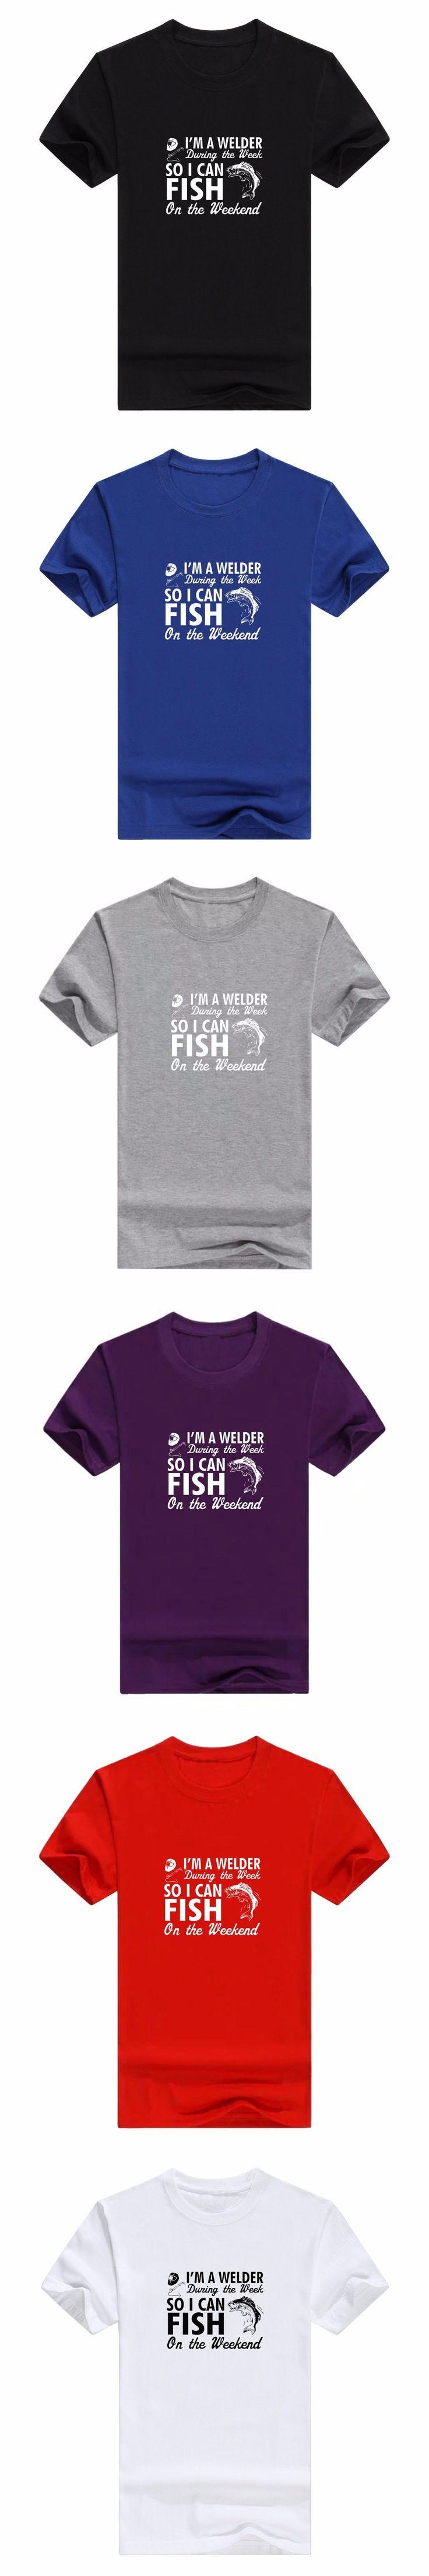 men's casual t-shirt folder tshirt design supplies Welder Gift So I Can Fish on the Weekend Premium men's T-shirt